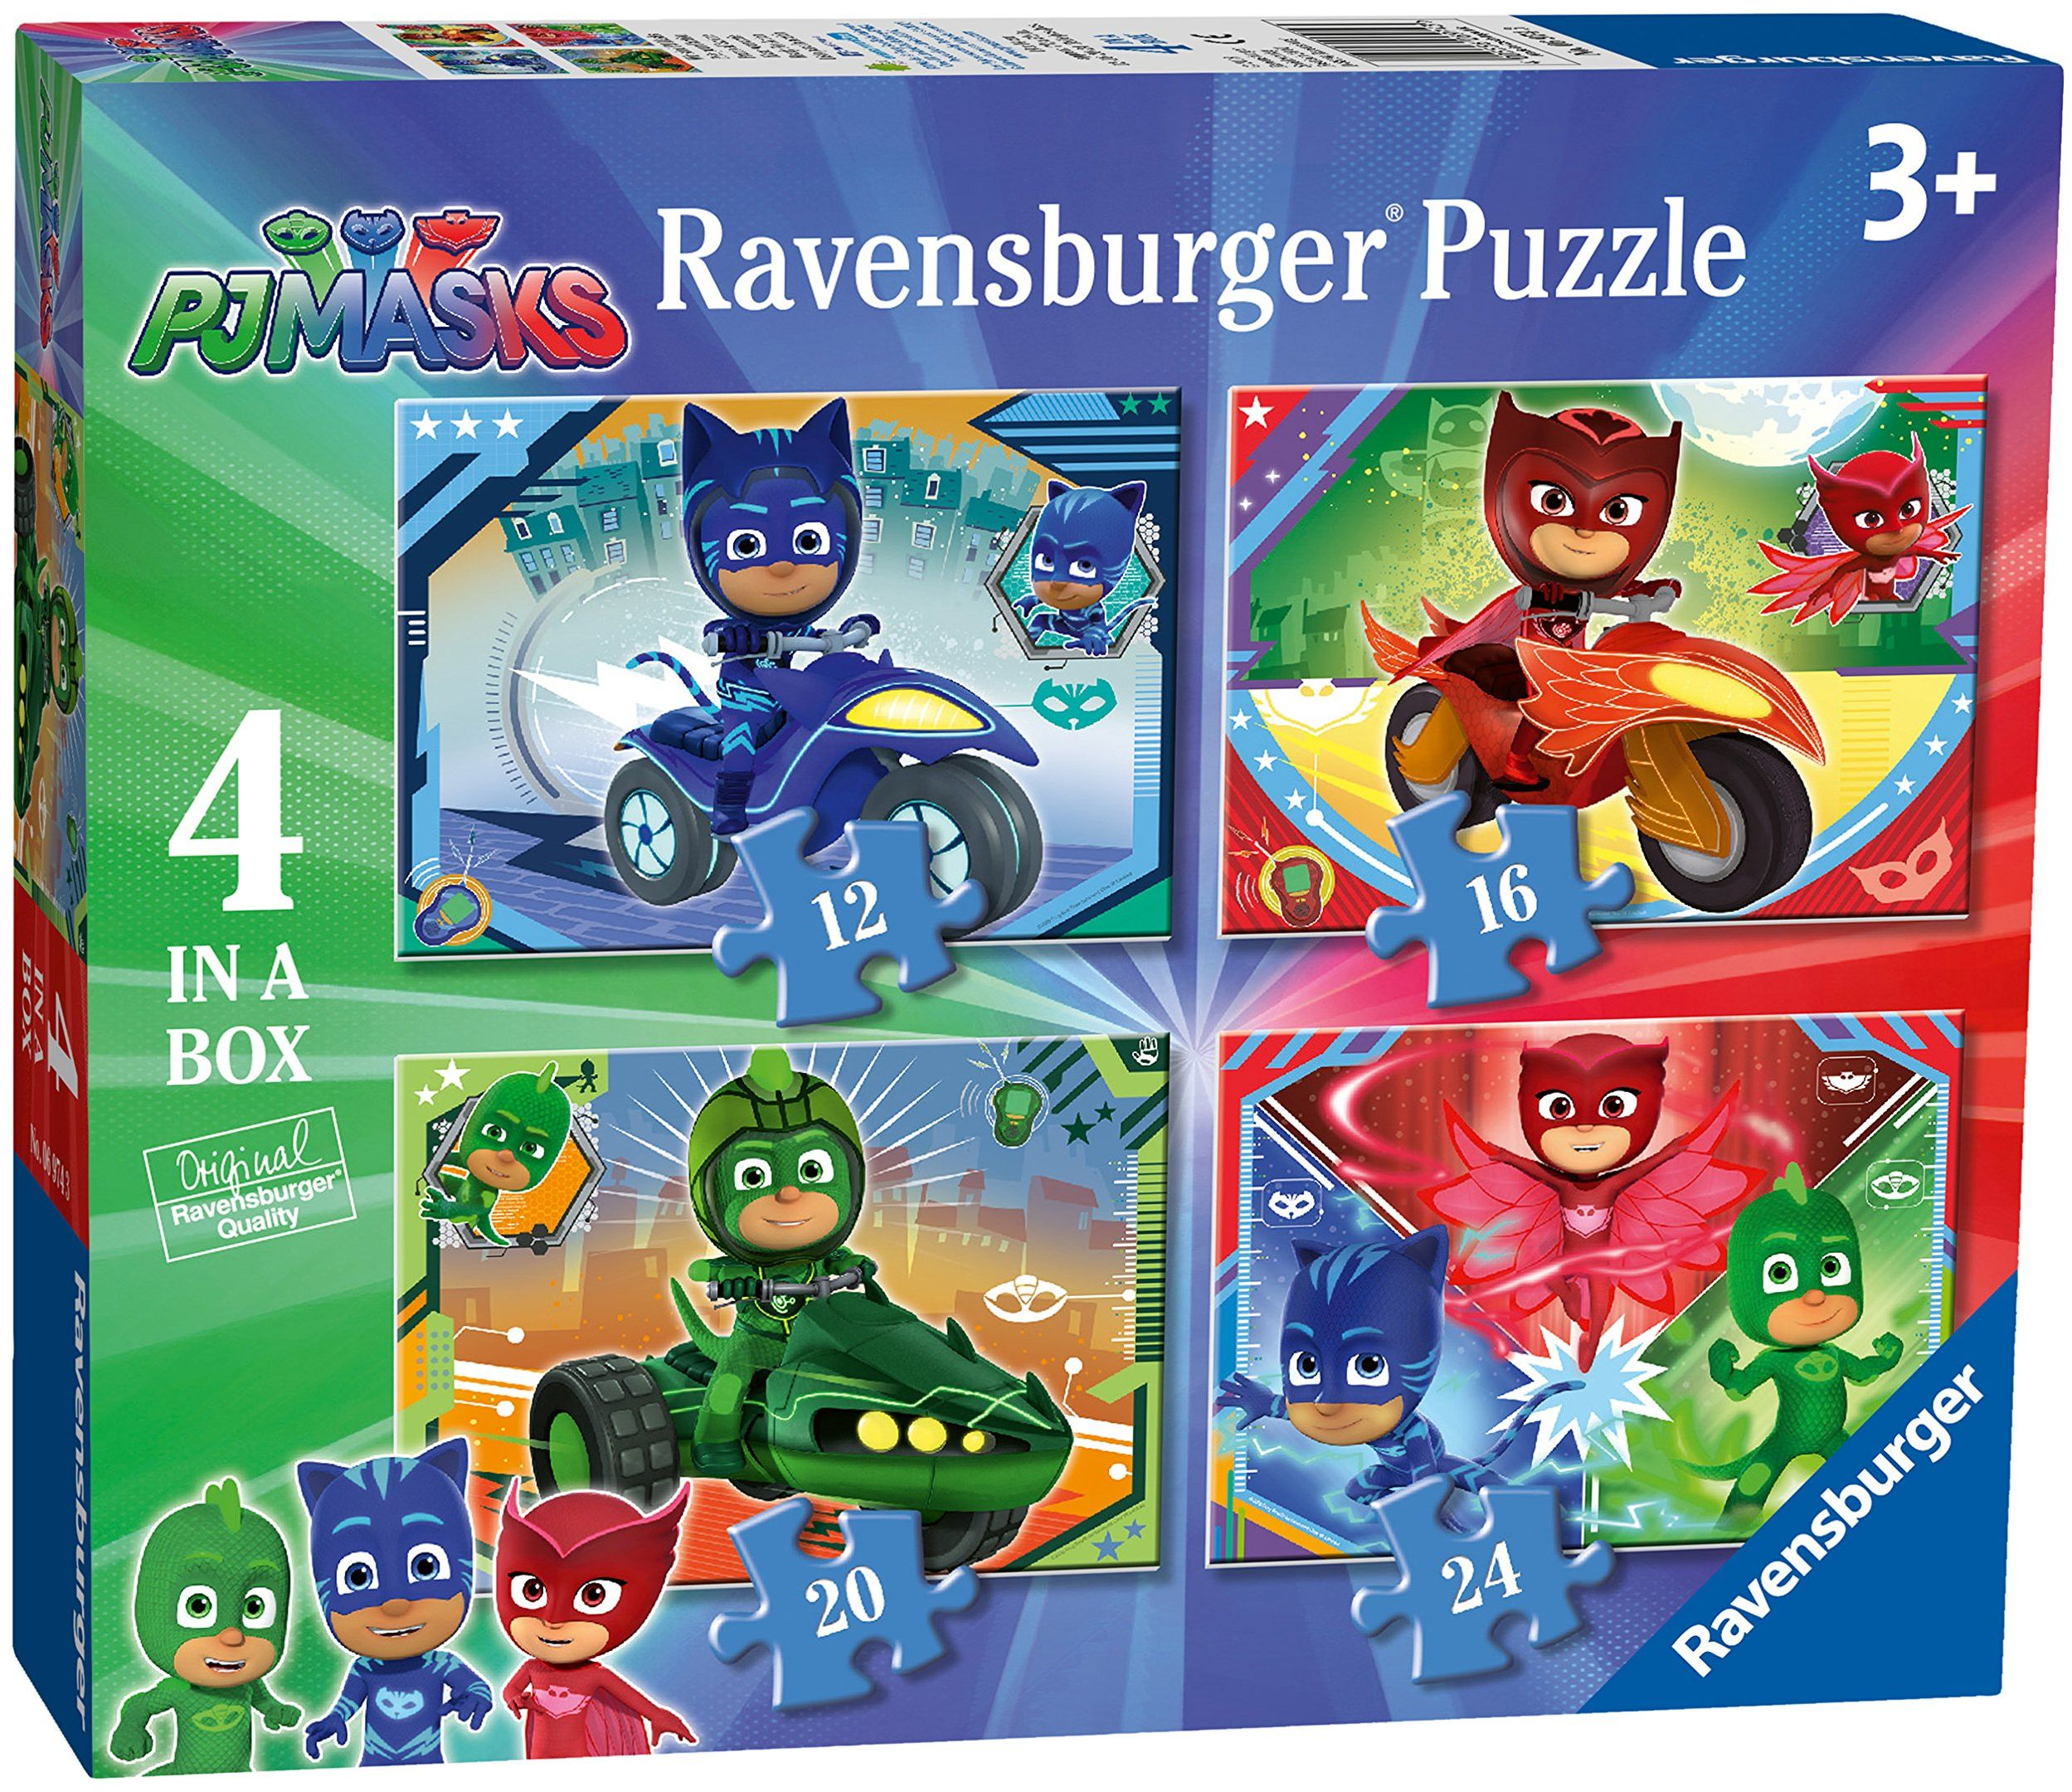 Ravensburger 6974 PJ Masks-4 w pudełku (12, 16, 20, 24 sztuk) puzzle dla dzieci w wieku od 3 lat